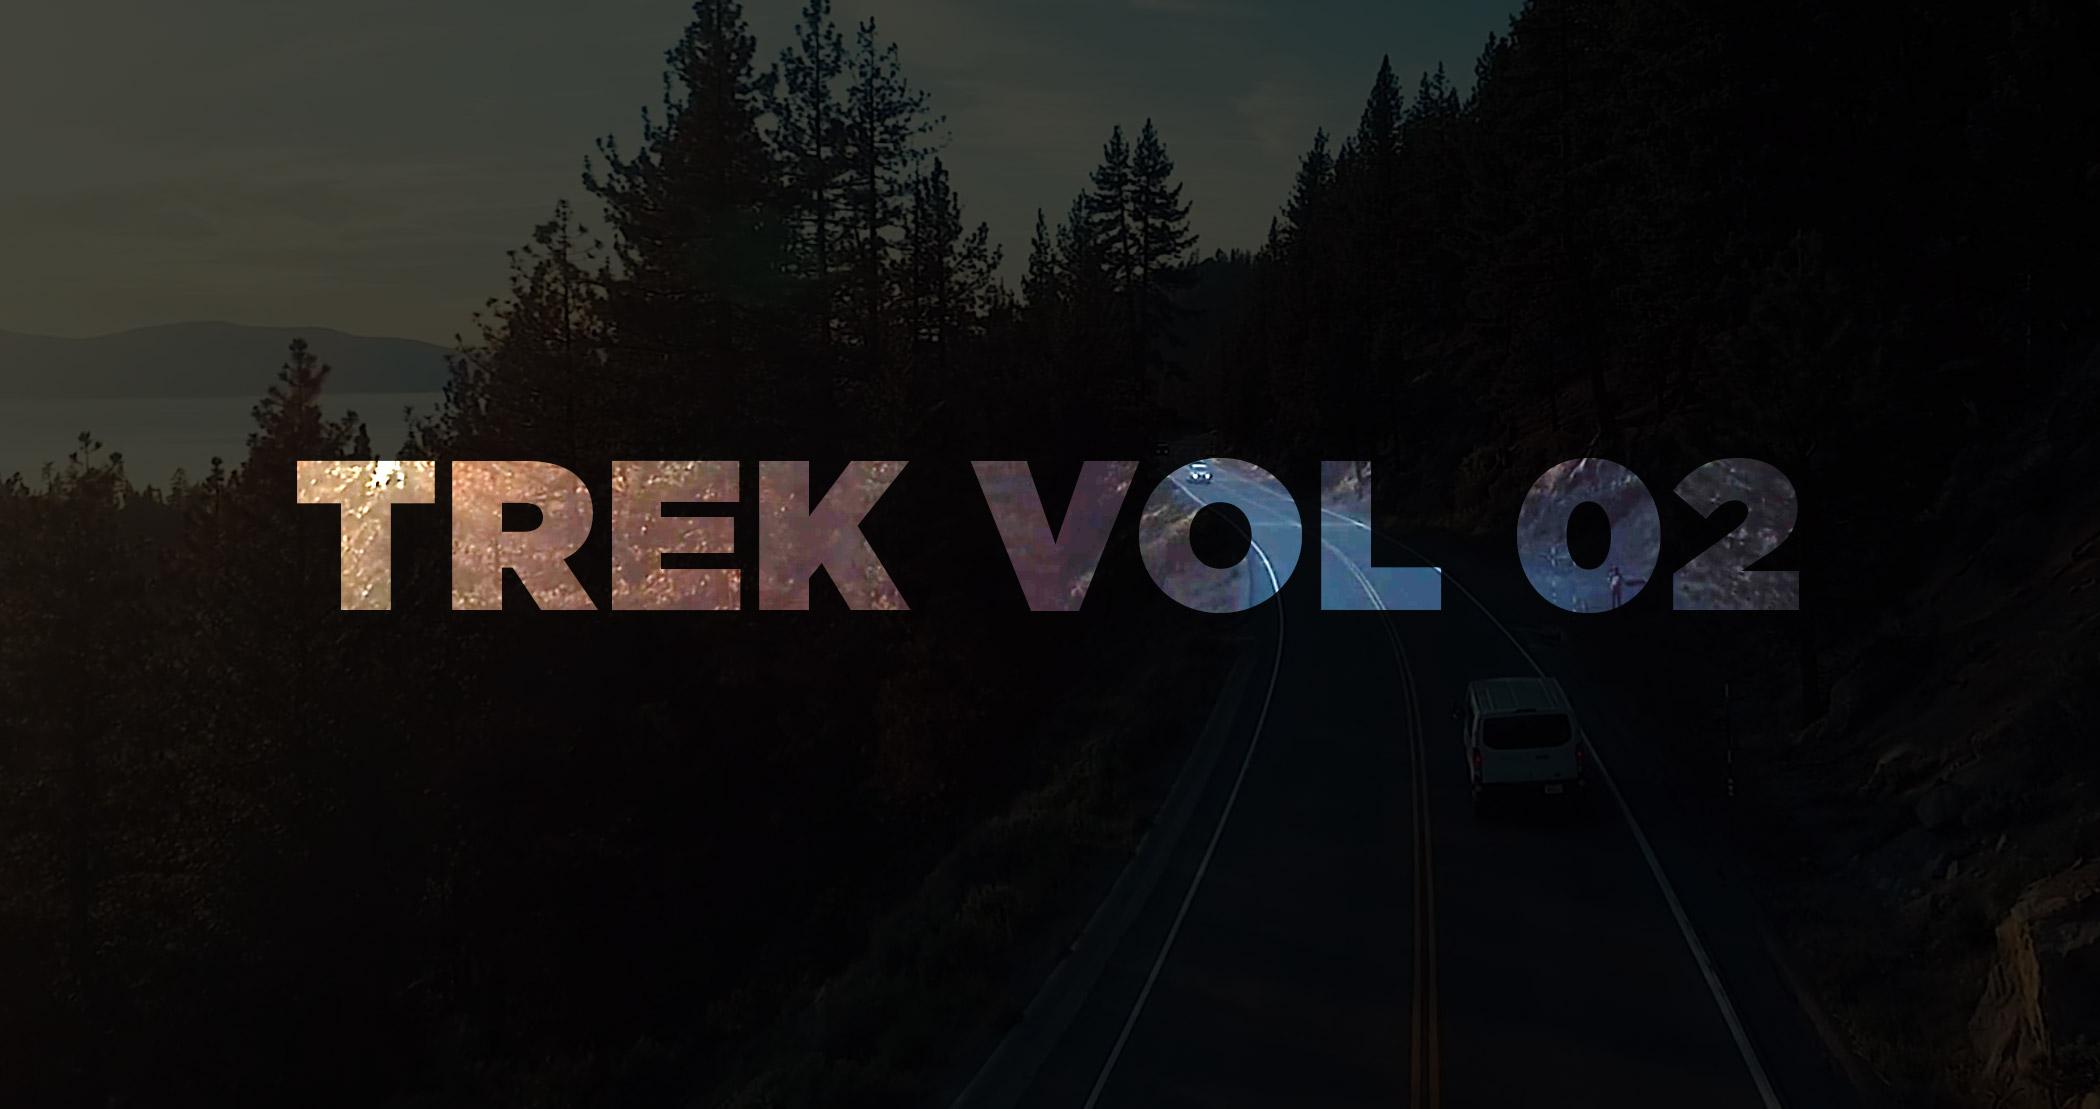 Trek Vol 02